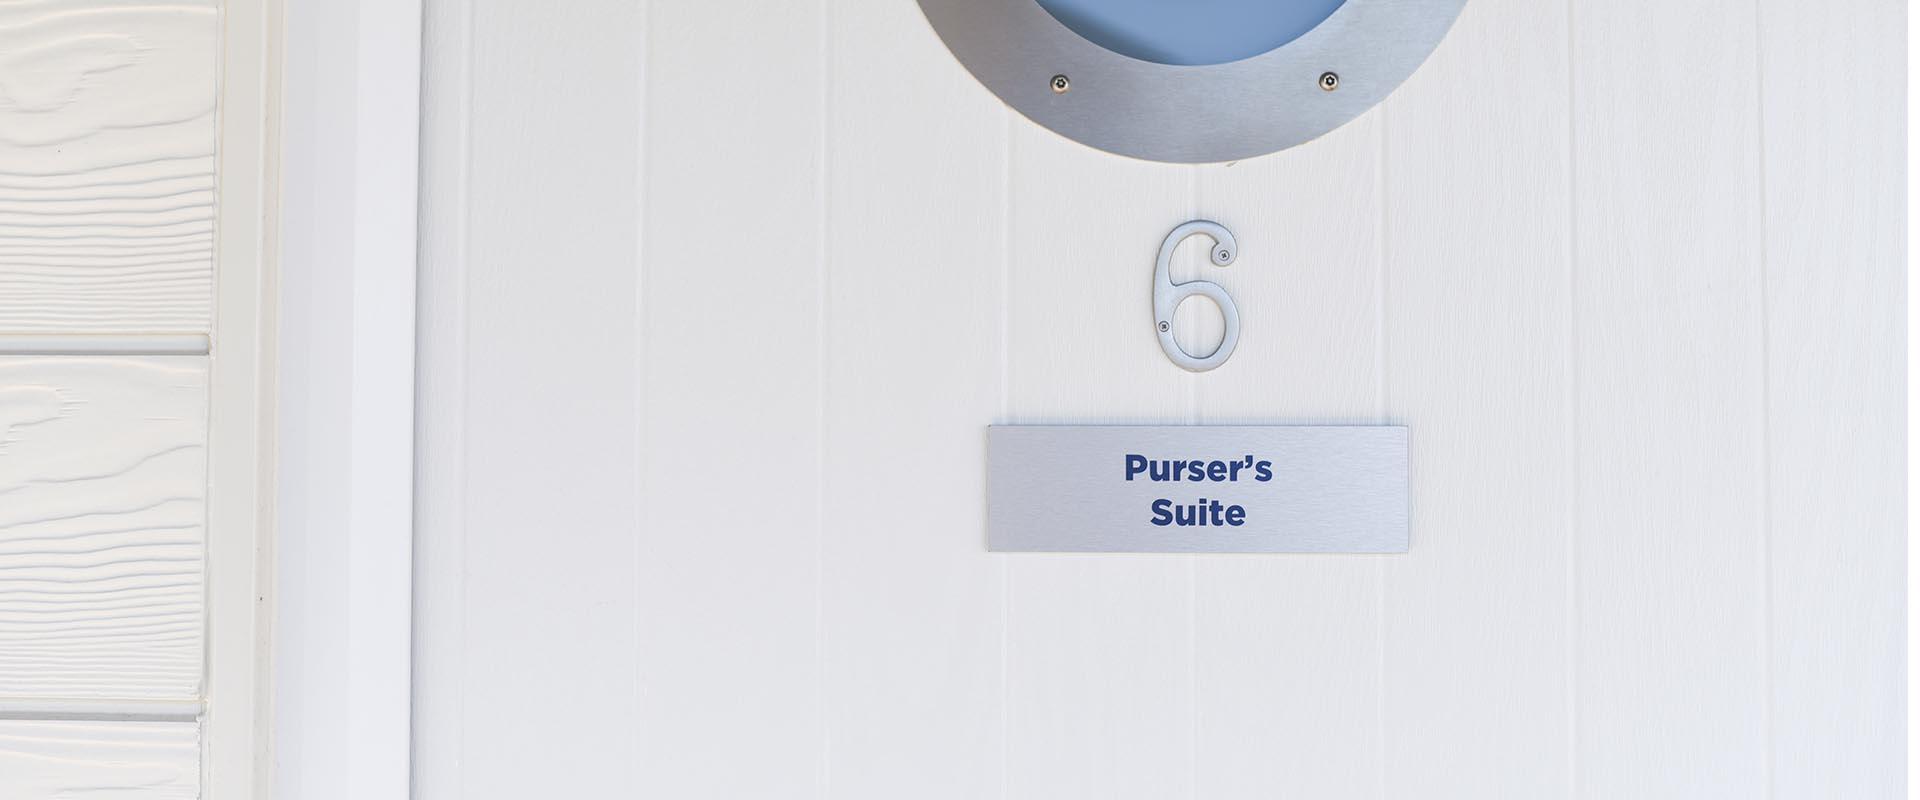 6 – Purser's Suite